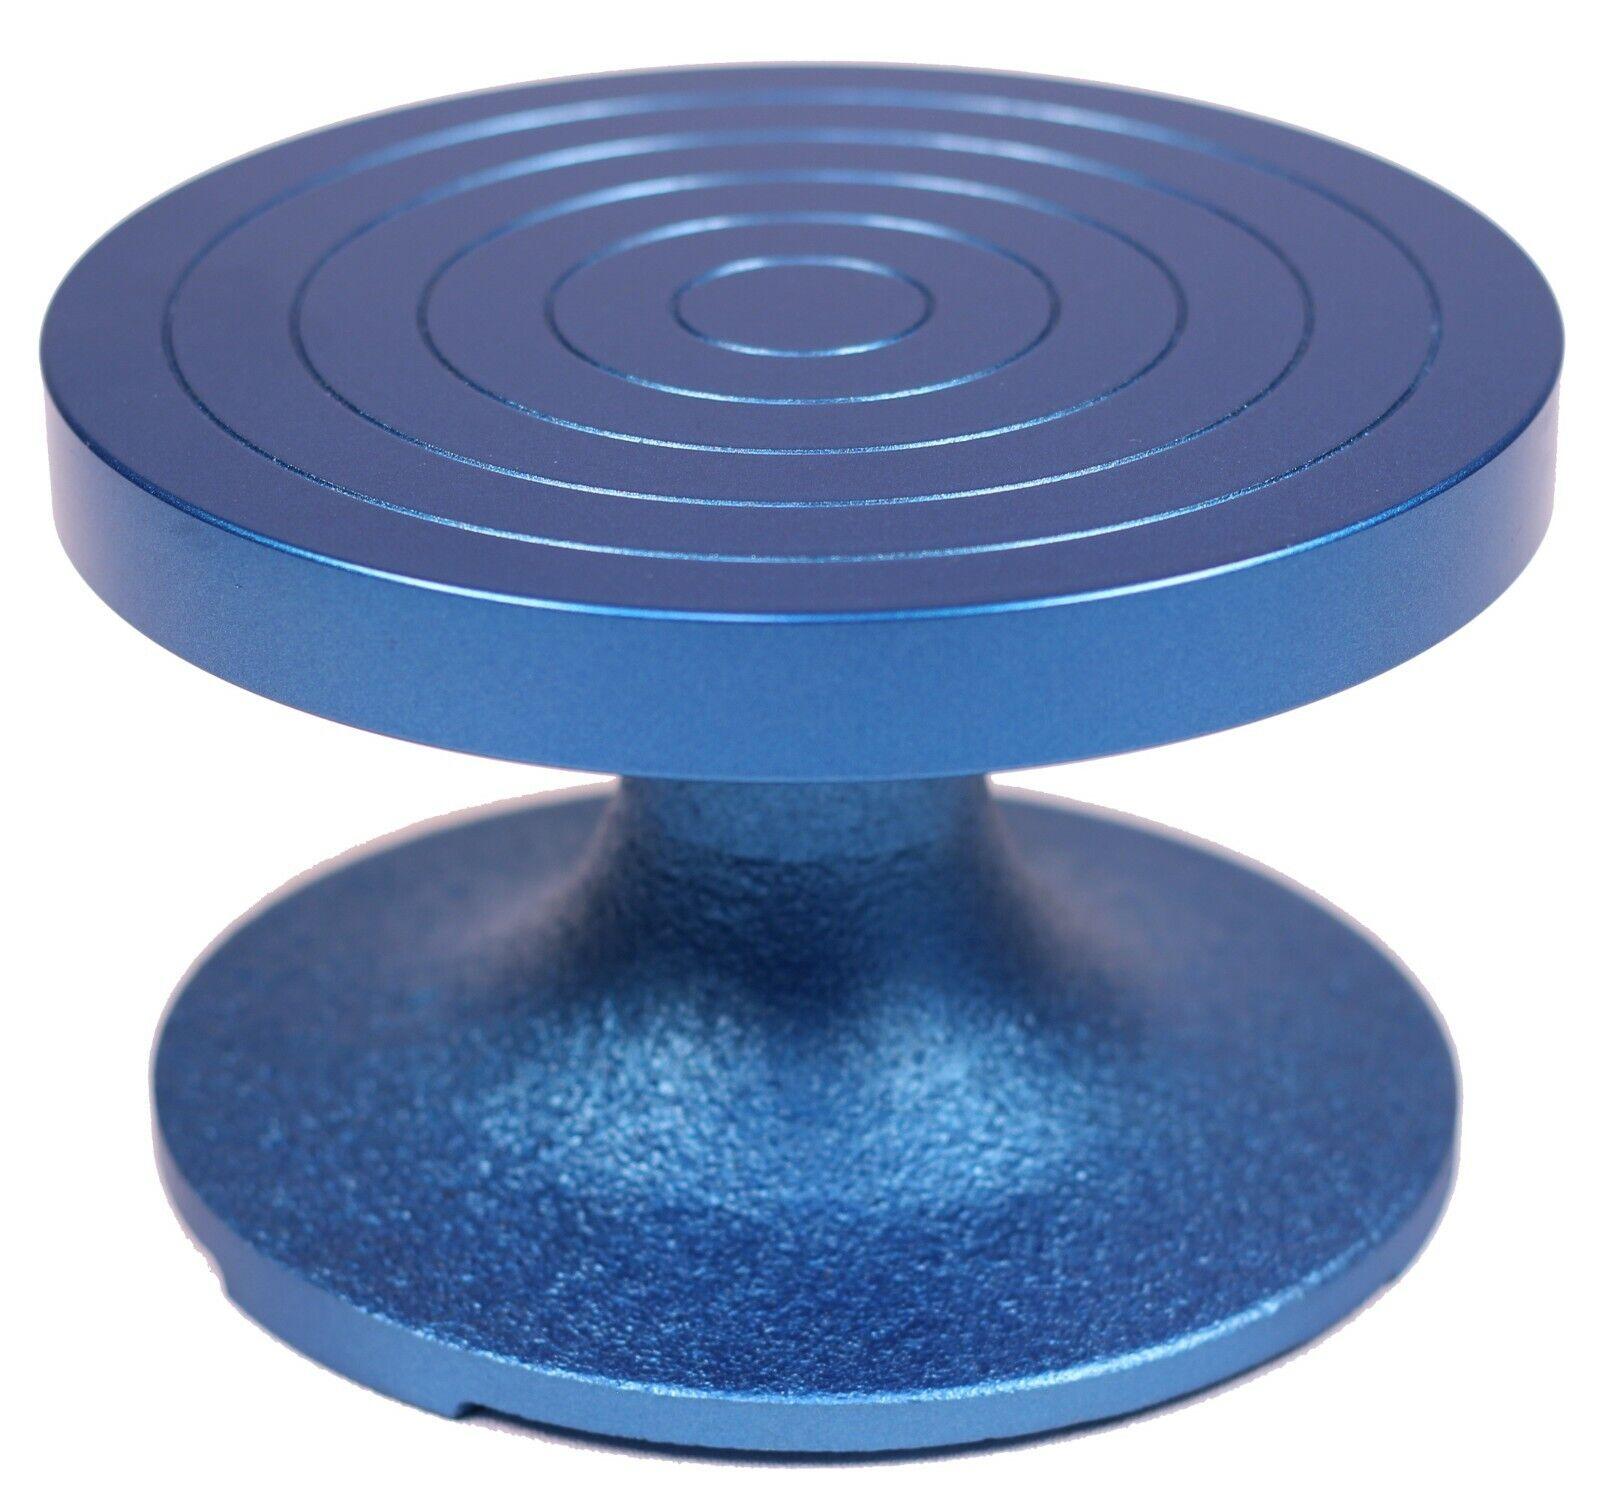 Creative Hobbies BW-18M Professional Sculpting Wheel 7″ Dia., Heavy Duty, Blue Ceramics & Pottery